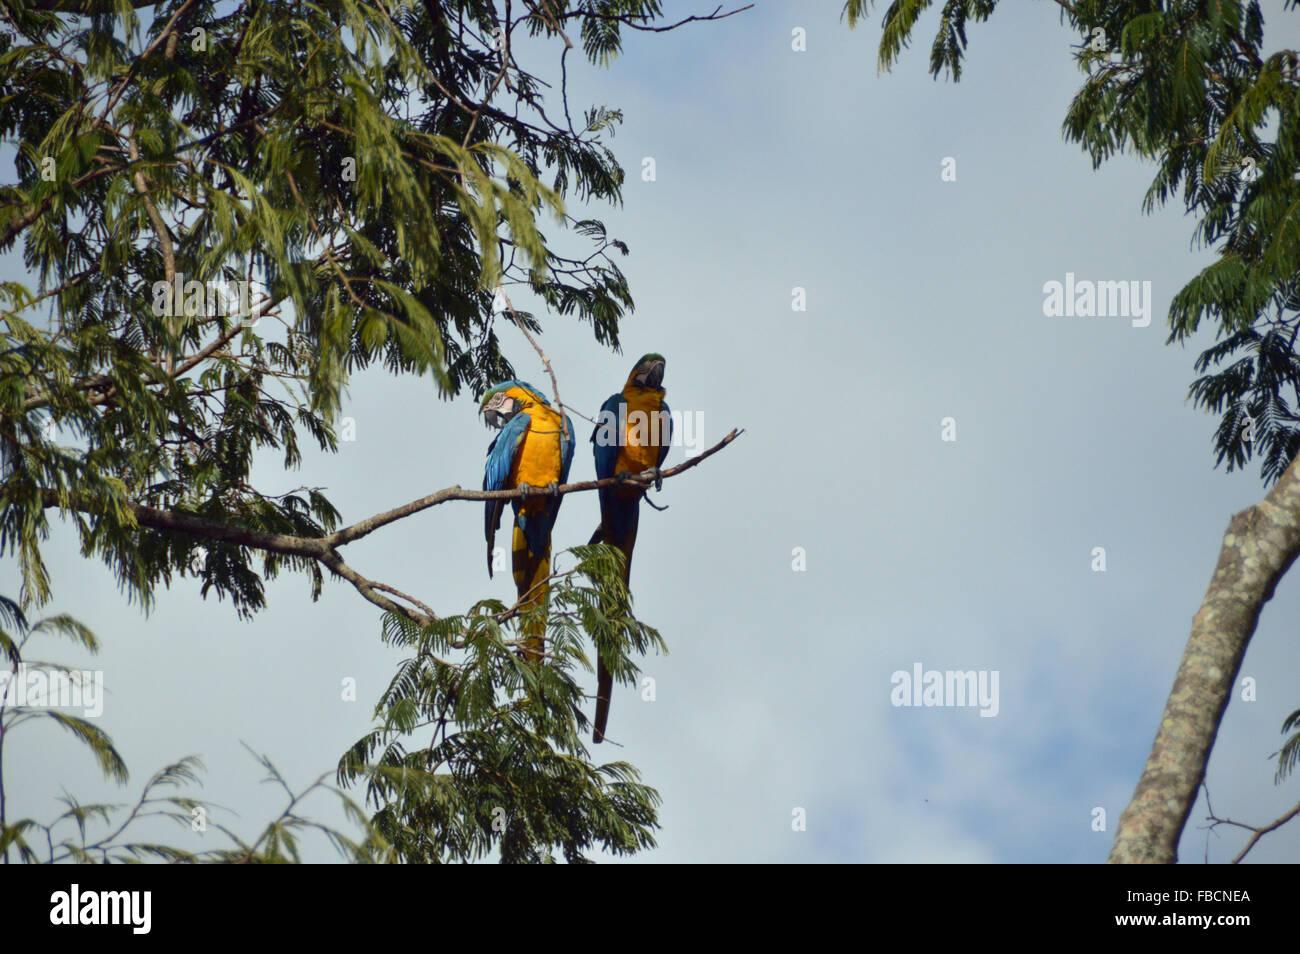 Araras canindé, blue and yellow macaws, birds, aves da Chapada dos veadeiros, Goiás. - Stock Image